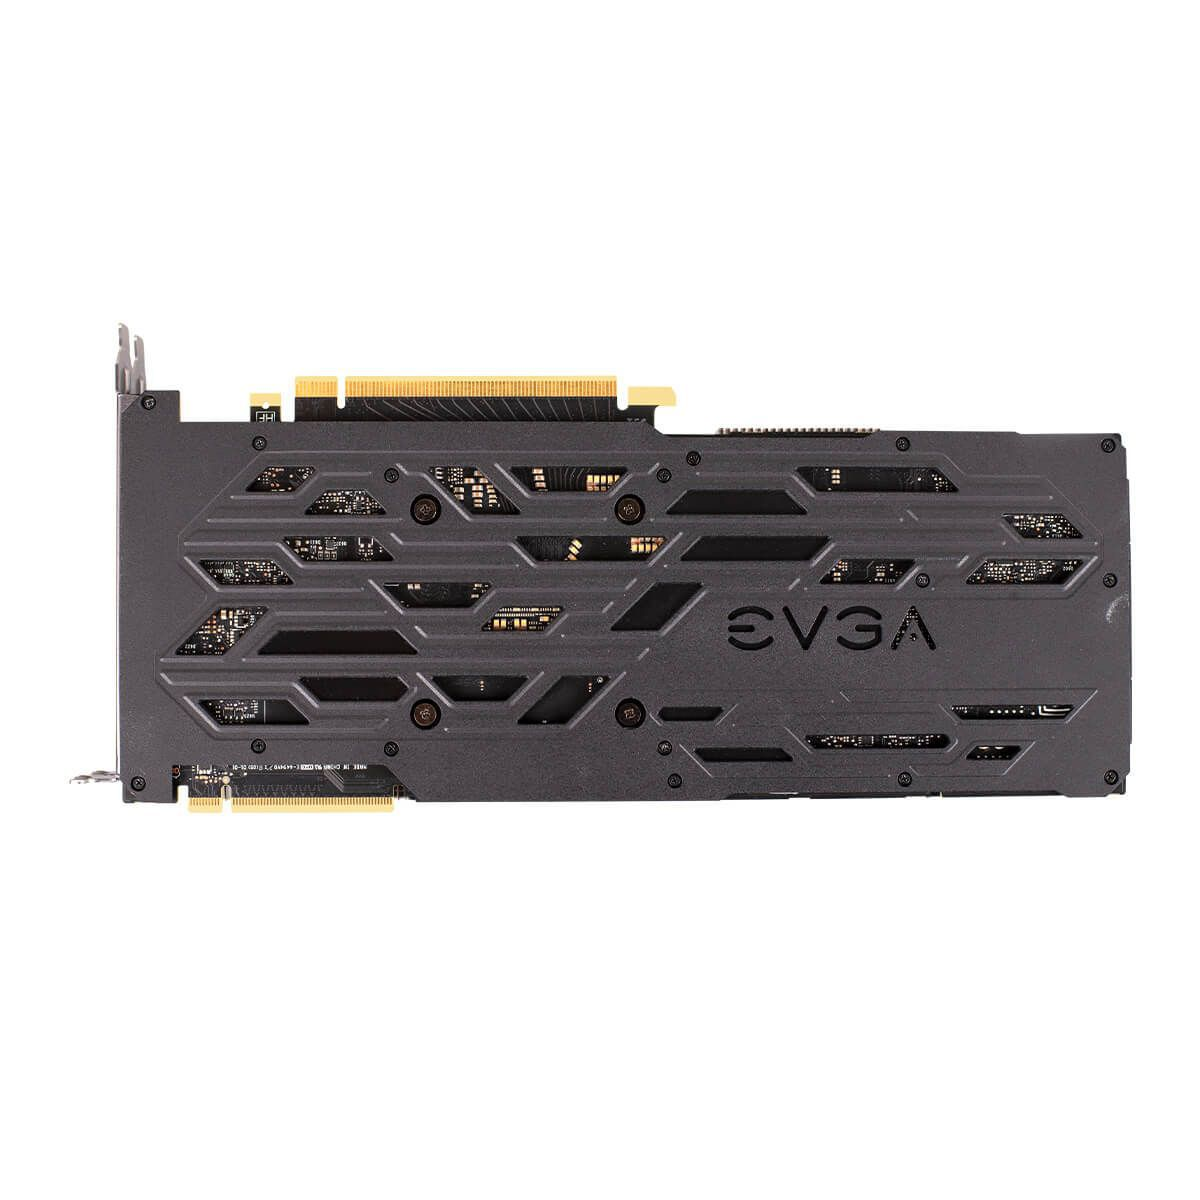 PLACA DE VIDEO NVIDIA GEFORCE RTX 2080 XC 8GB GDDR6 08G-P4-2182-KR